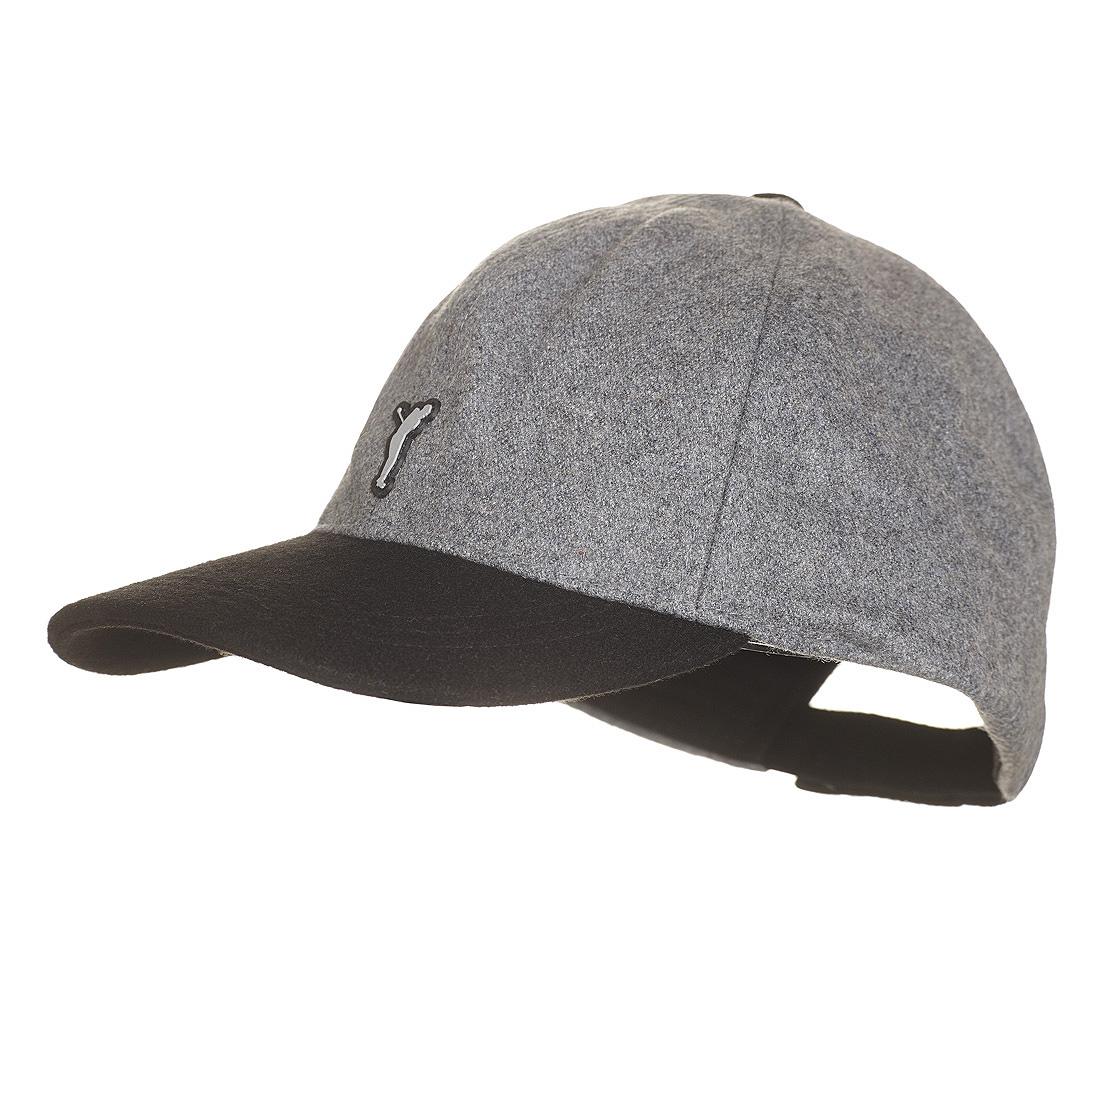 Baseball Cap aus Wolle